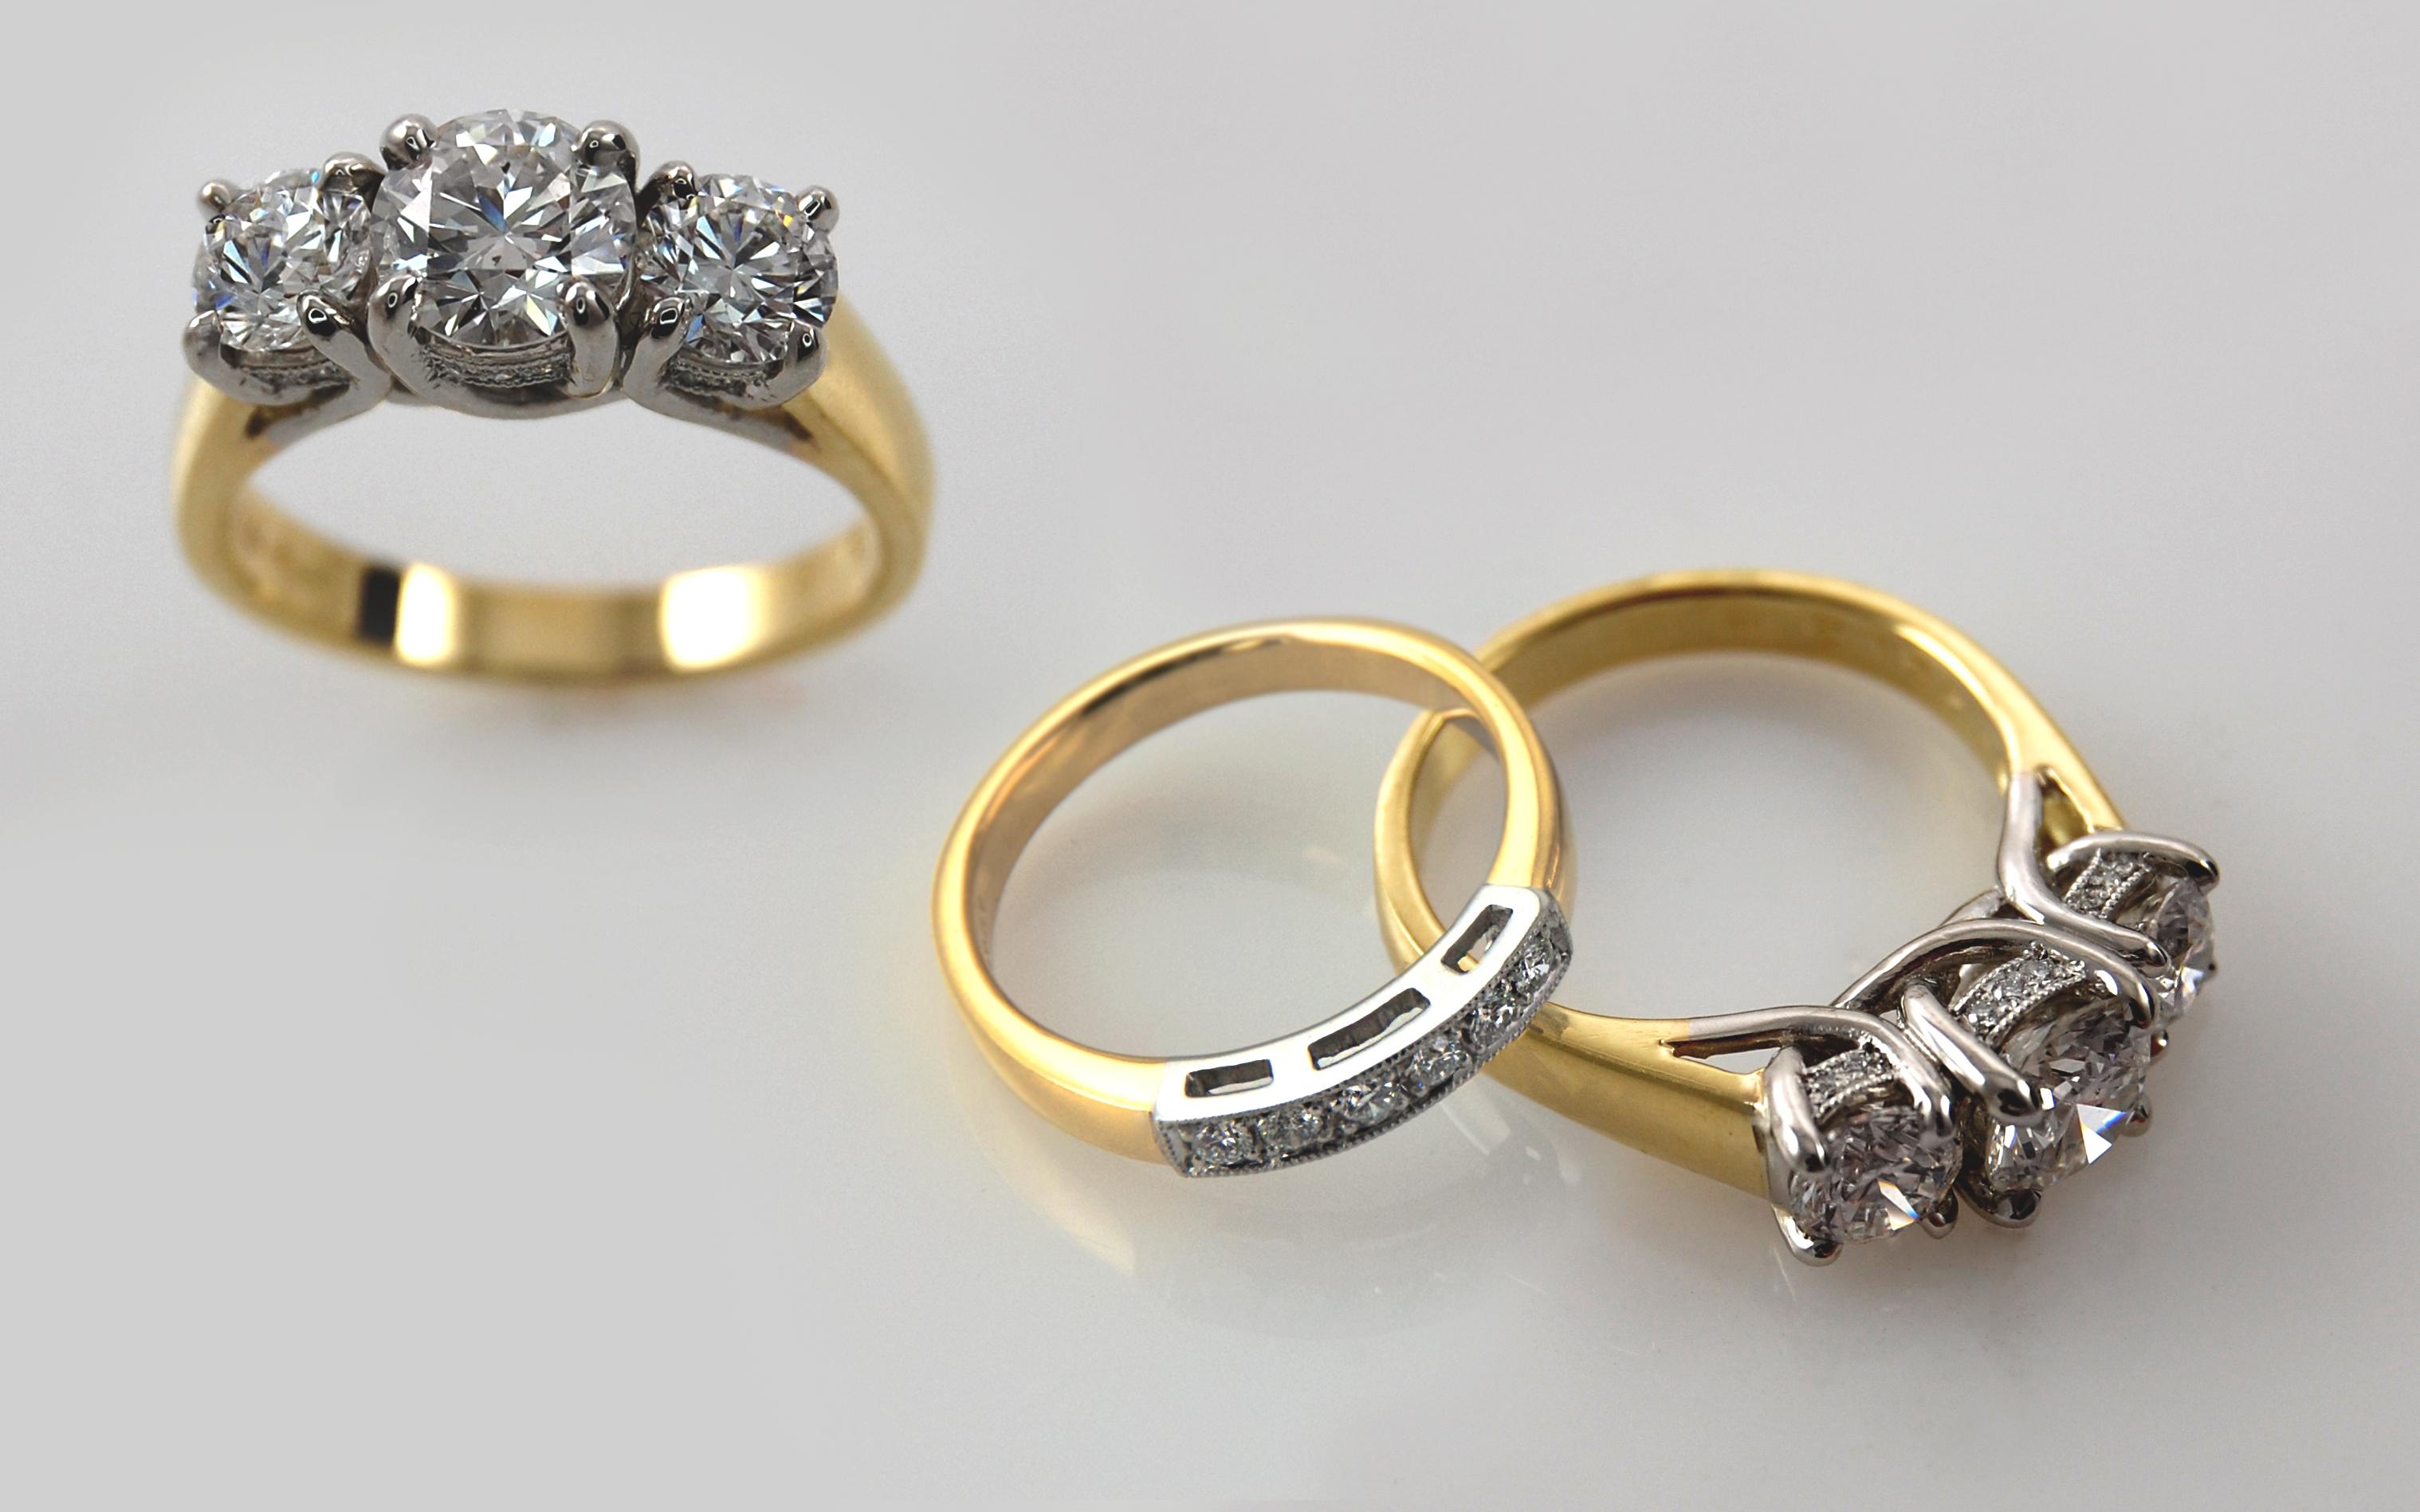 Platinum & 18K 2 carat total with Bead Set Diamond Gallery